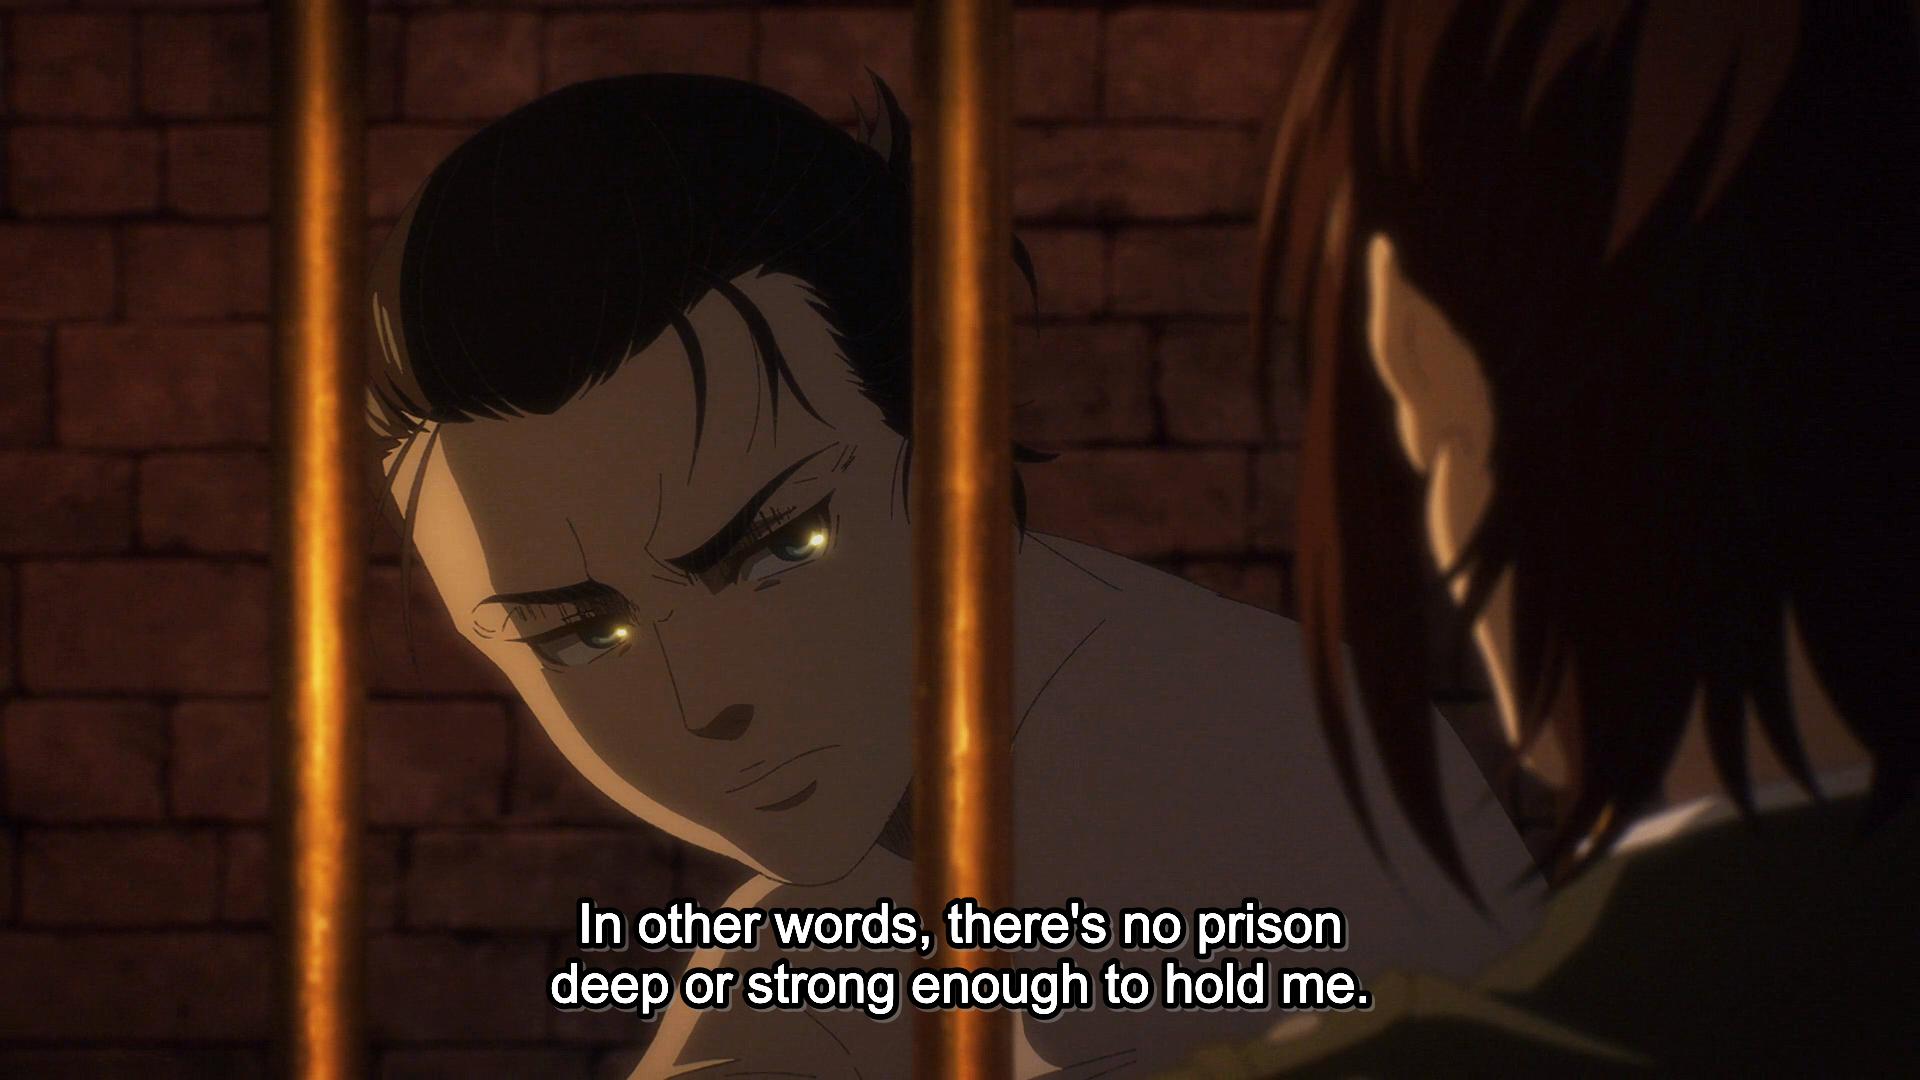 Attack on Titan - Final Season - No prison for Eren